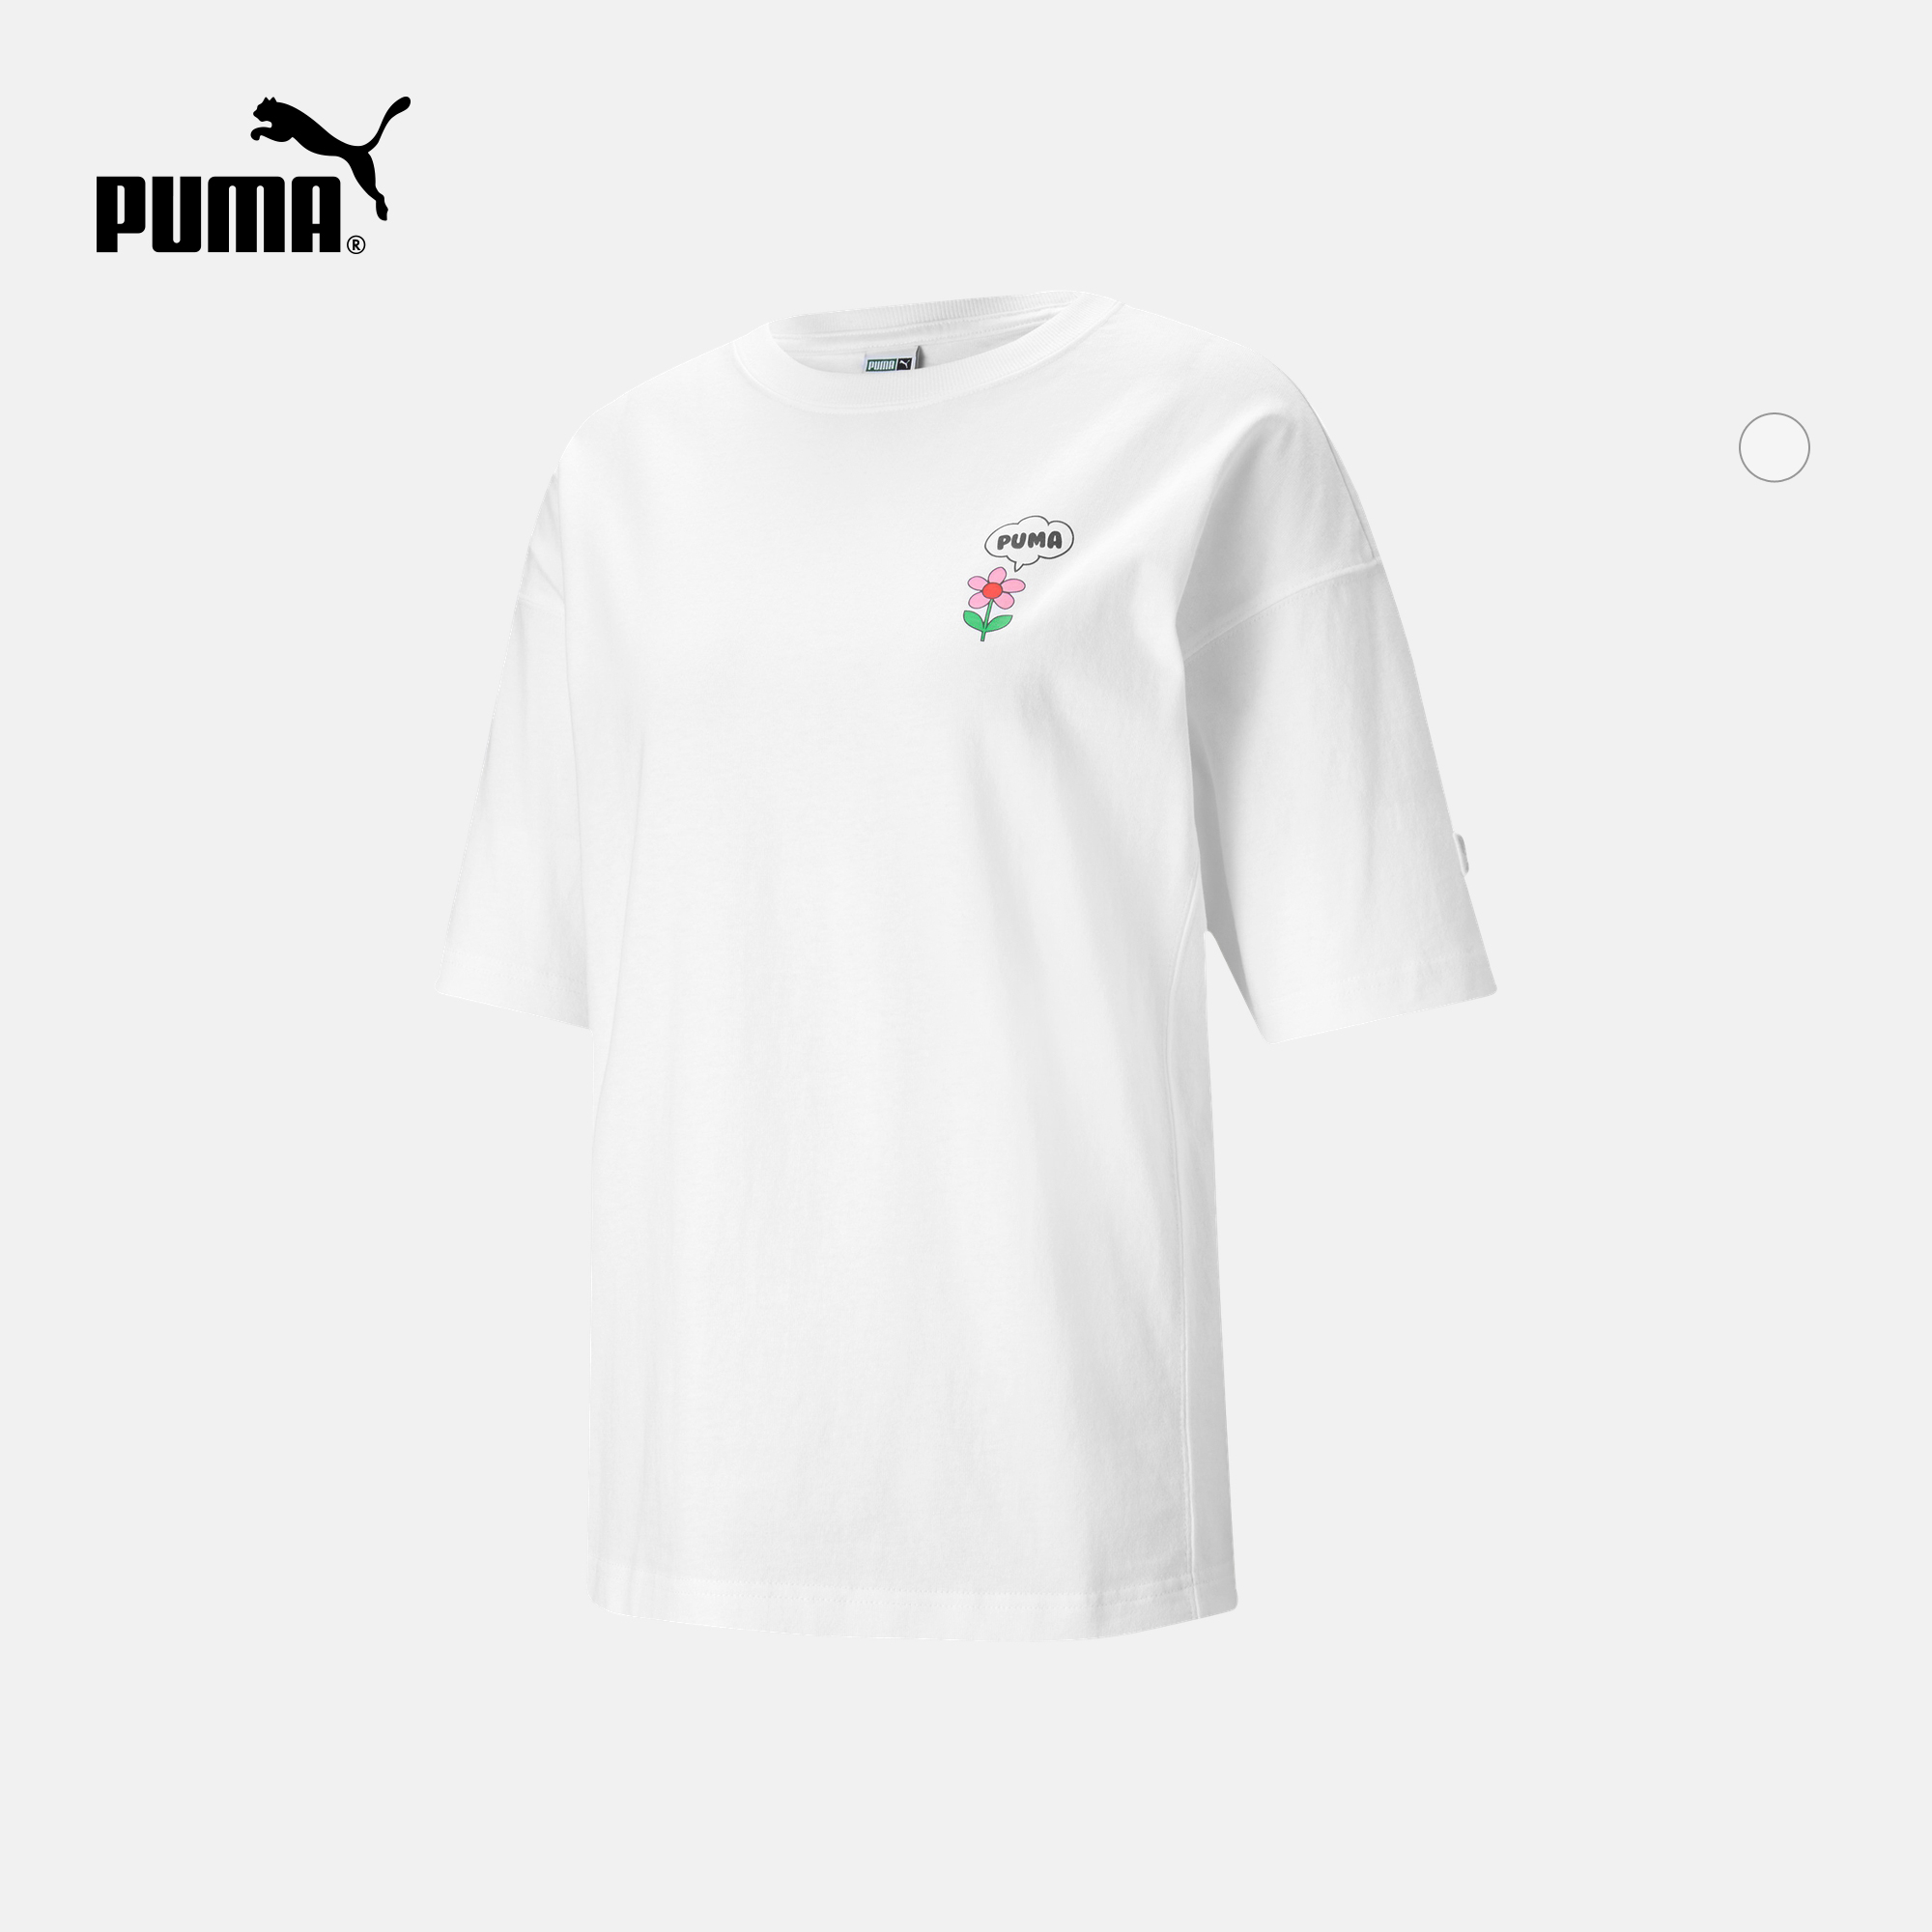 puma官方正品新款女子休闲印花t恤质量可靠吗